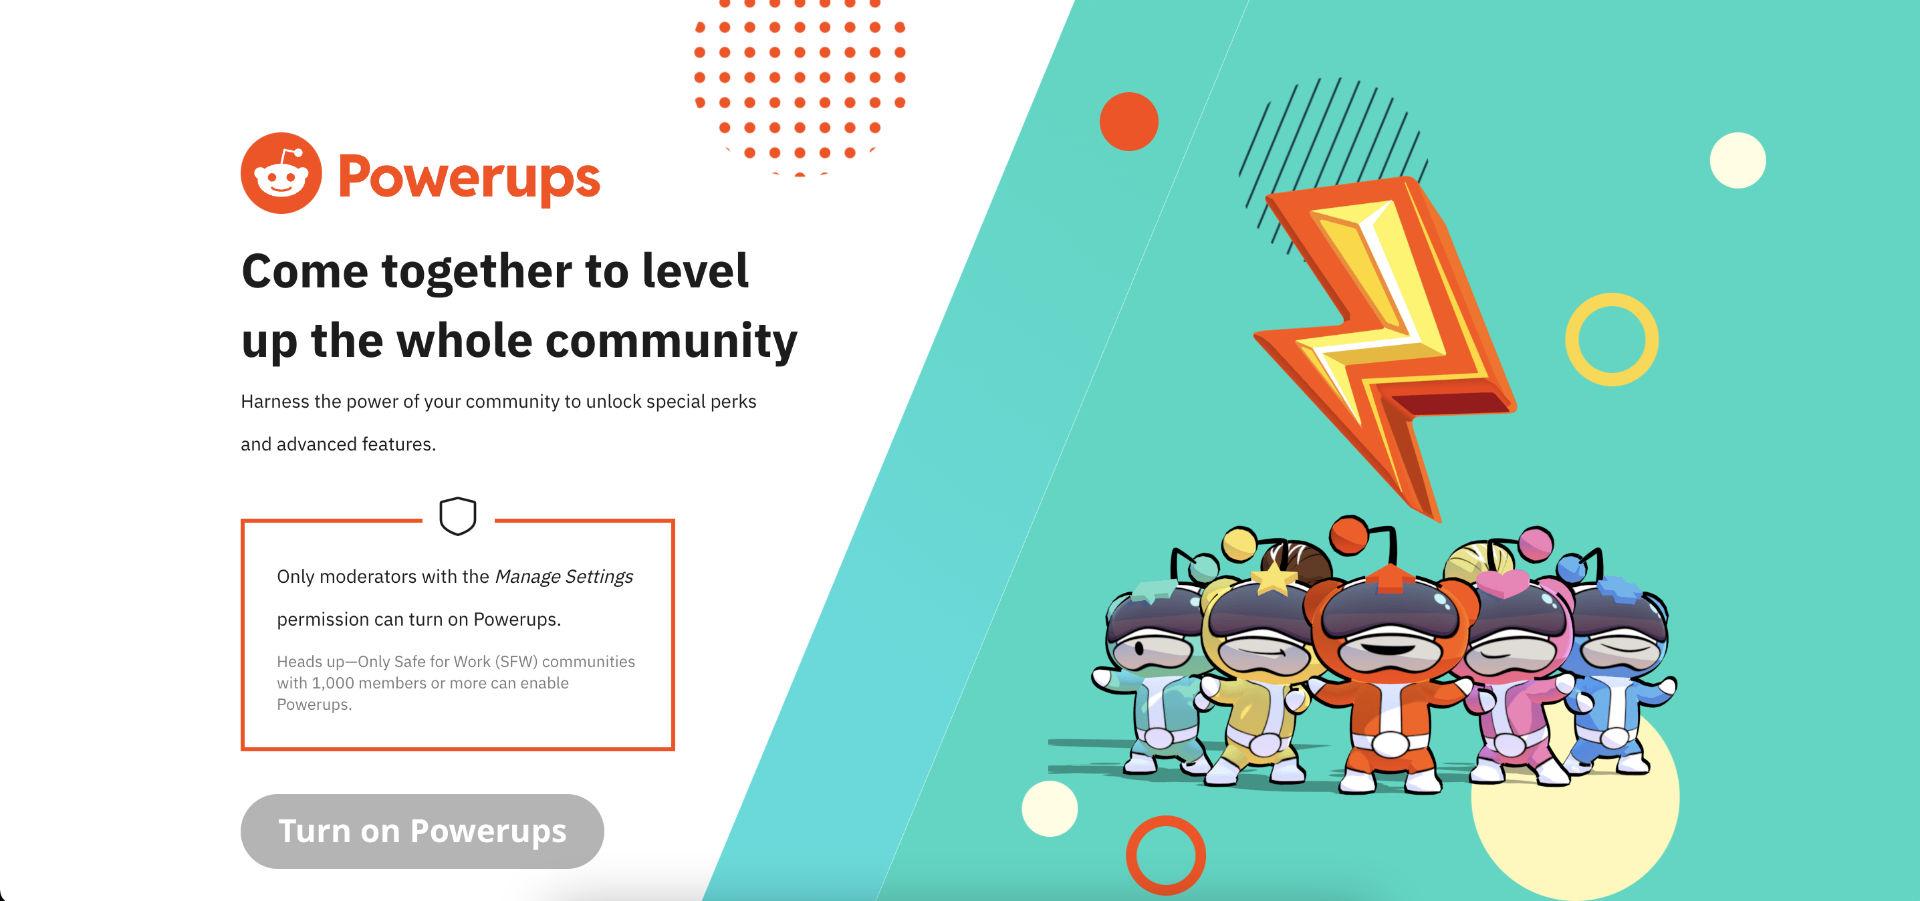 Reddit Powerups Webpage